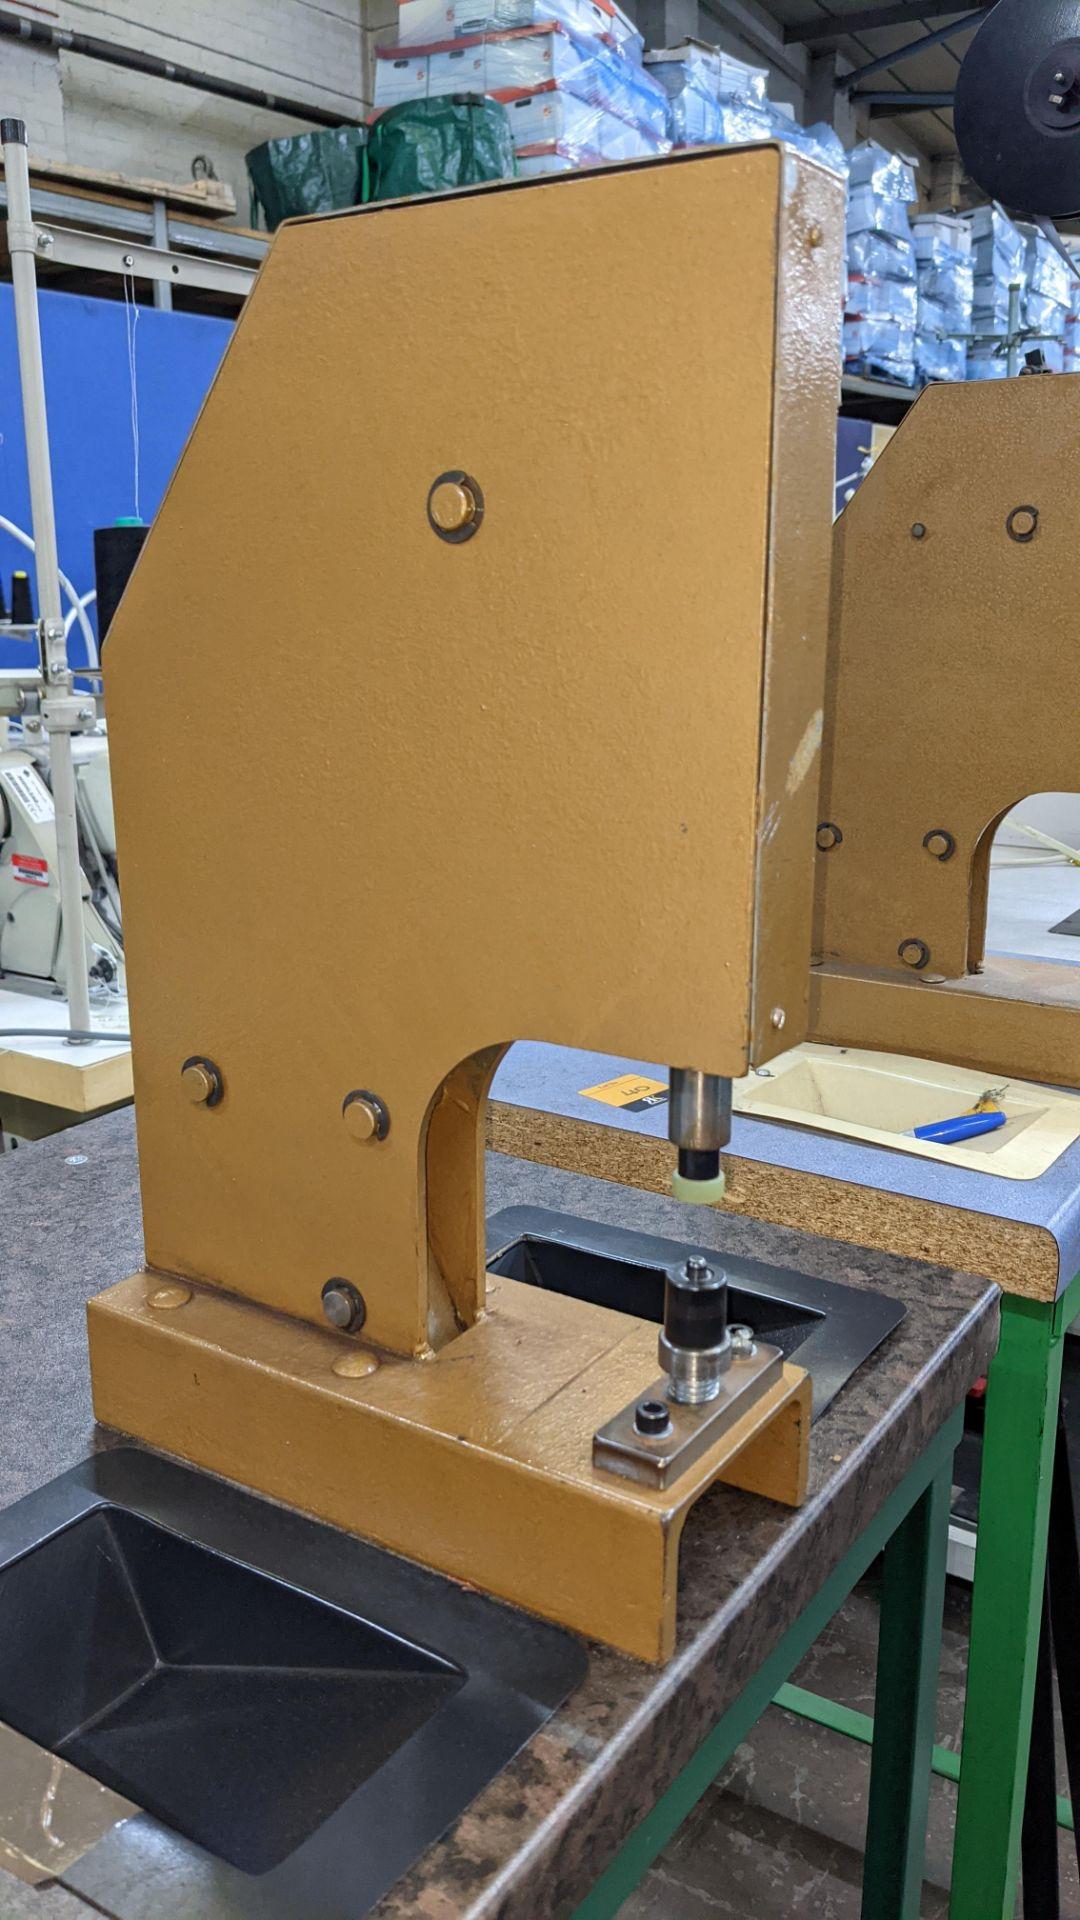 Foot operated riveting machine/press stud machine - Image 8 of 9